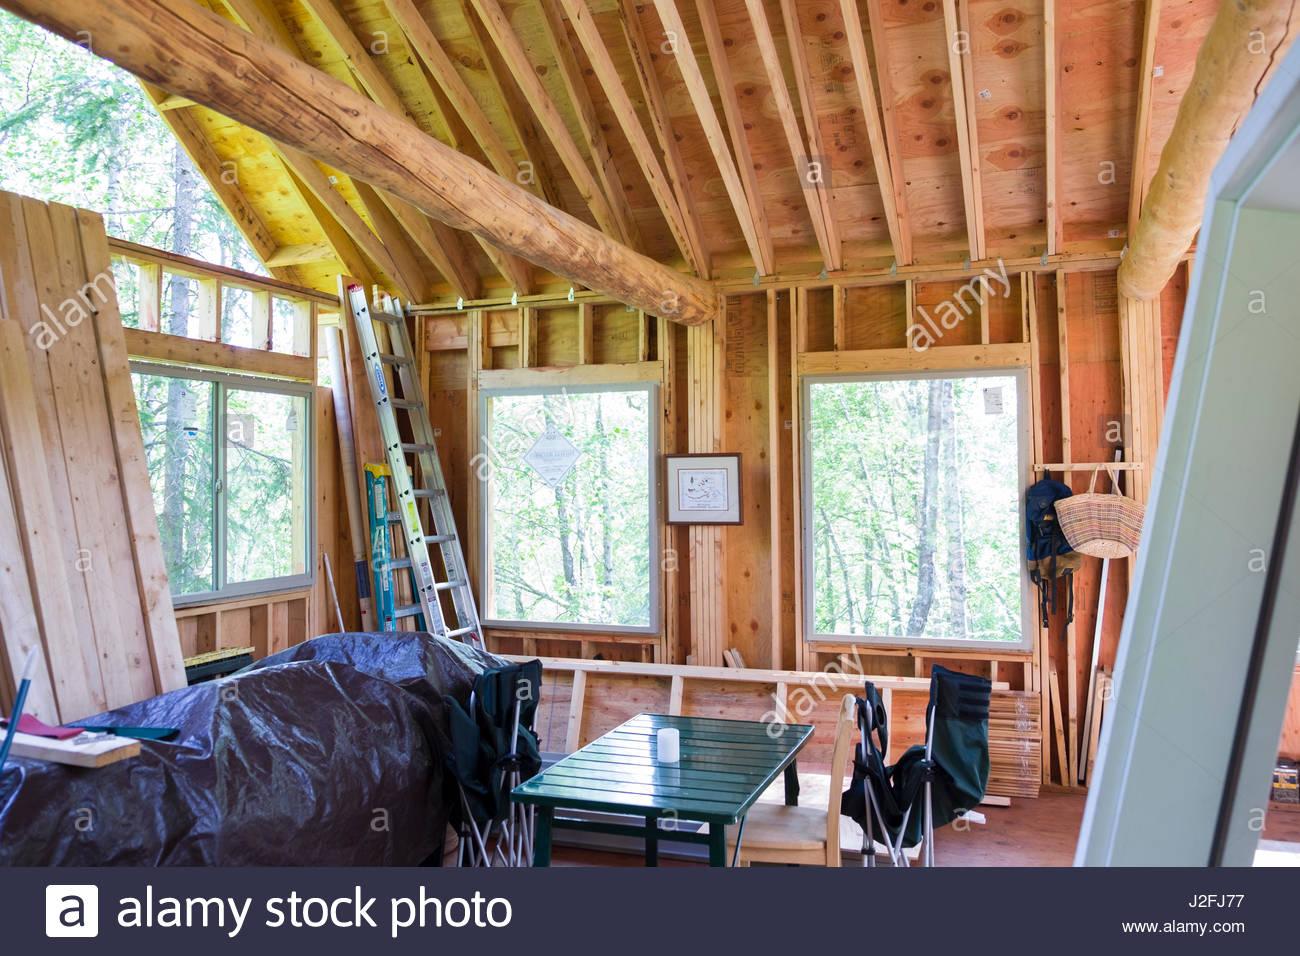 View of framing inside remote off-grid Alaskan cabin under construction, Matanuska-Susitna, Alaska, USA - Stock Image